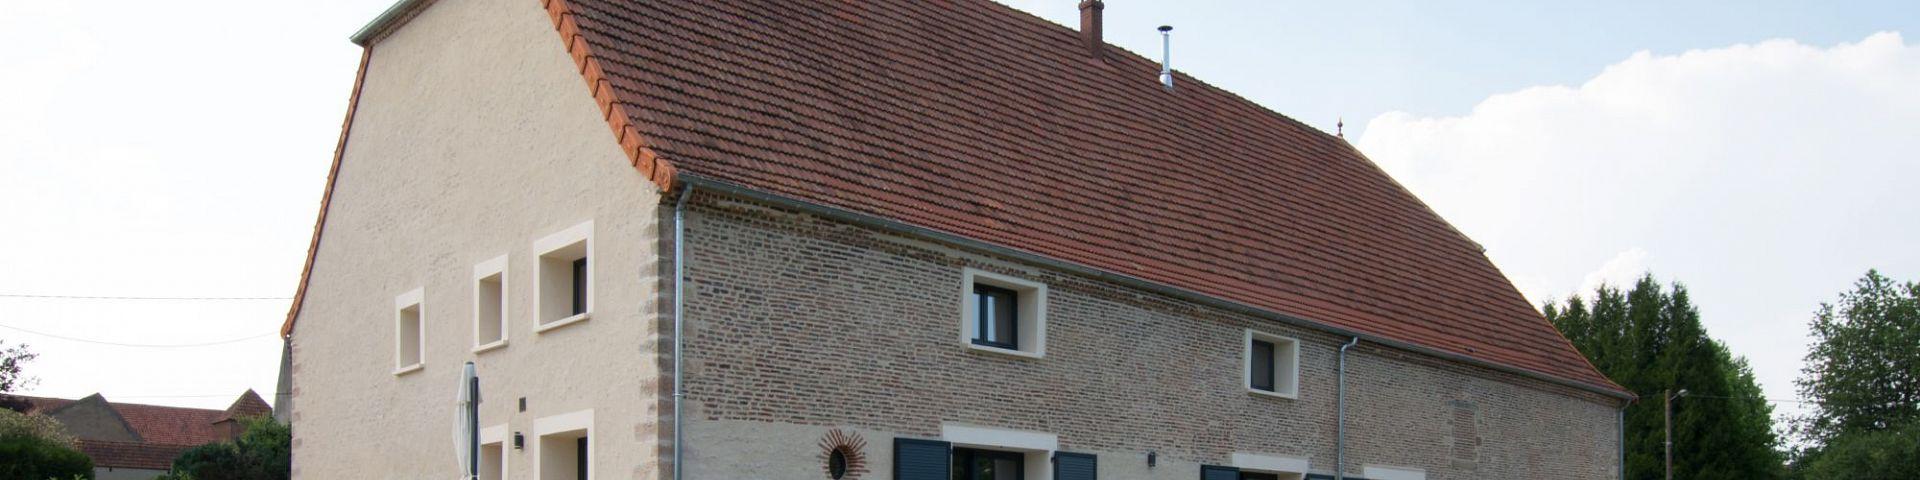 Bagnot - Grange (21)